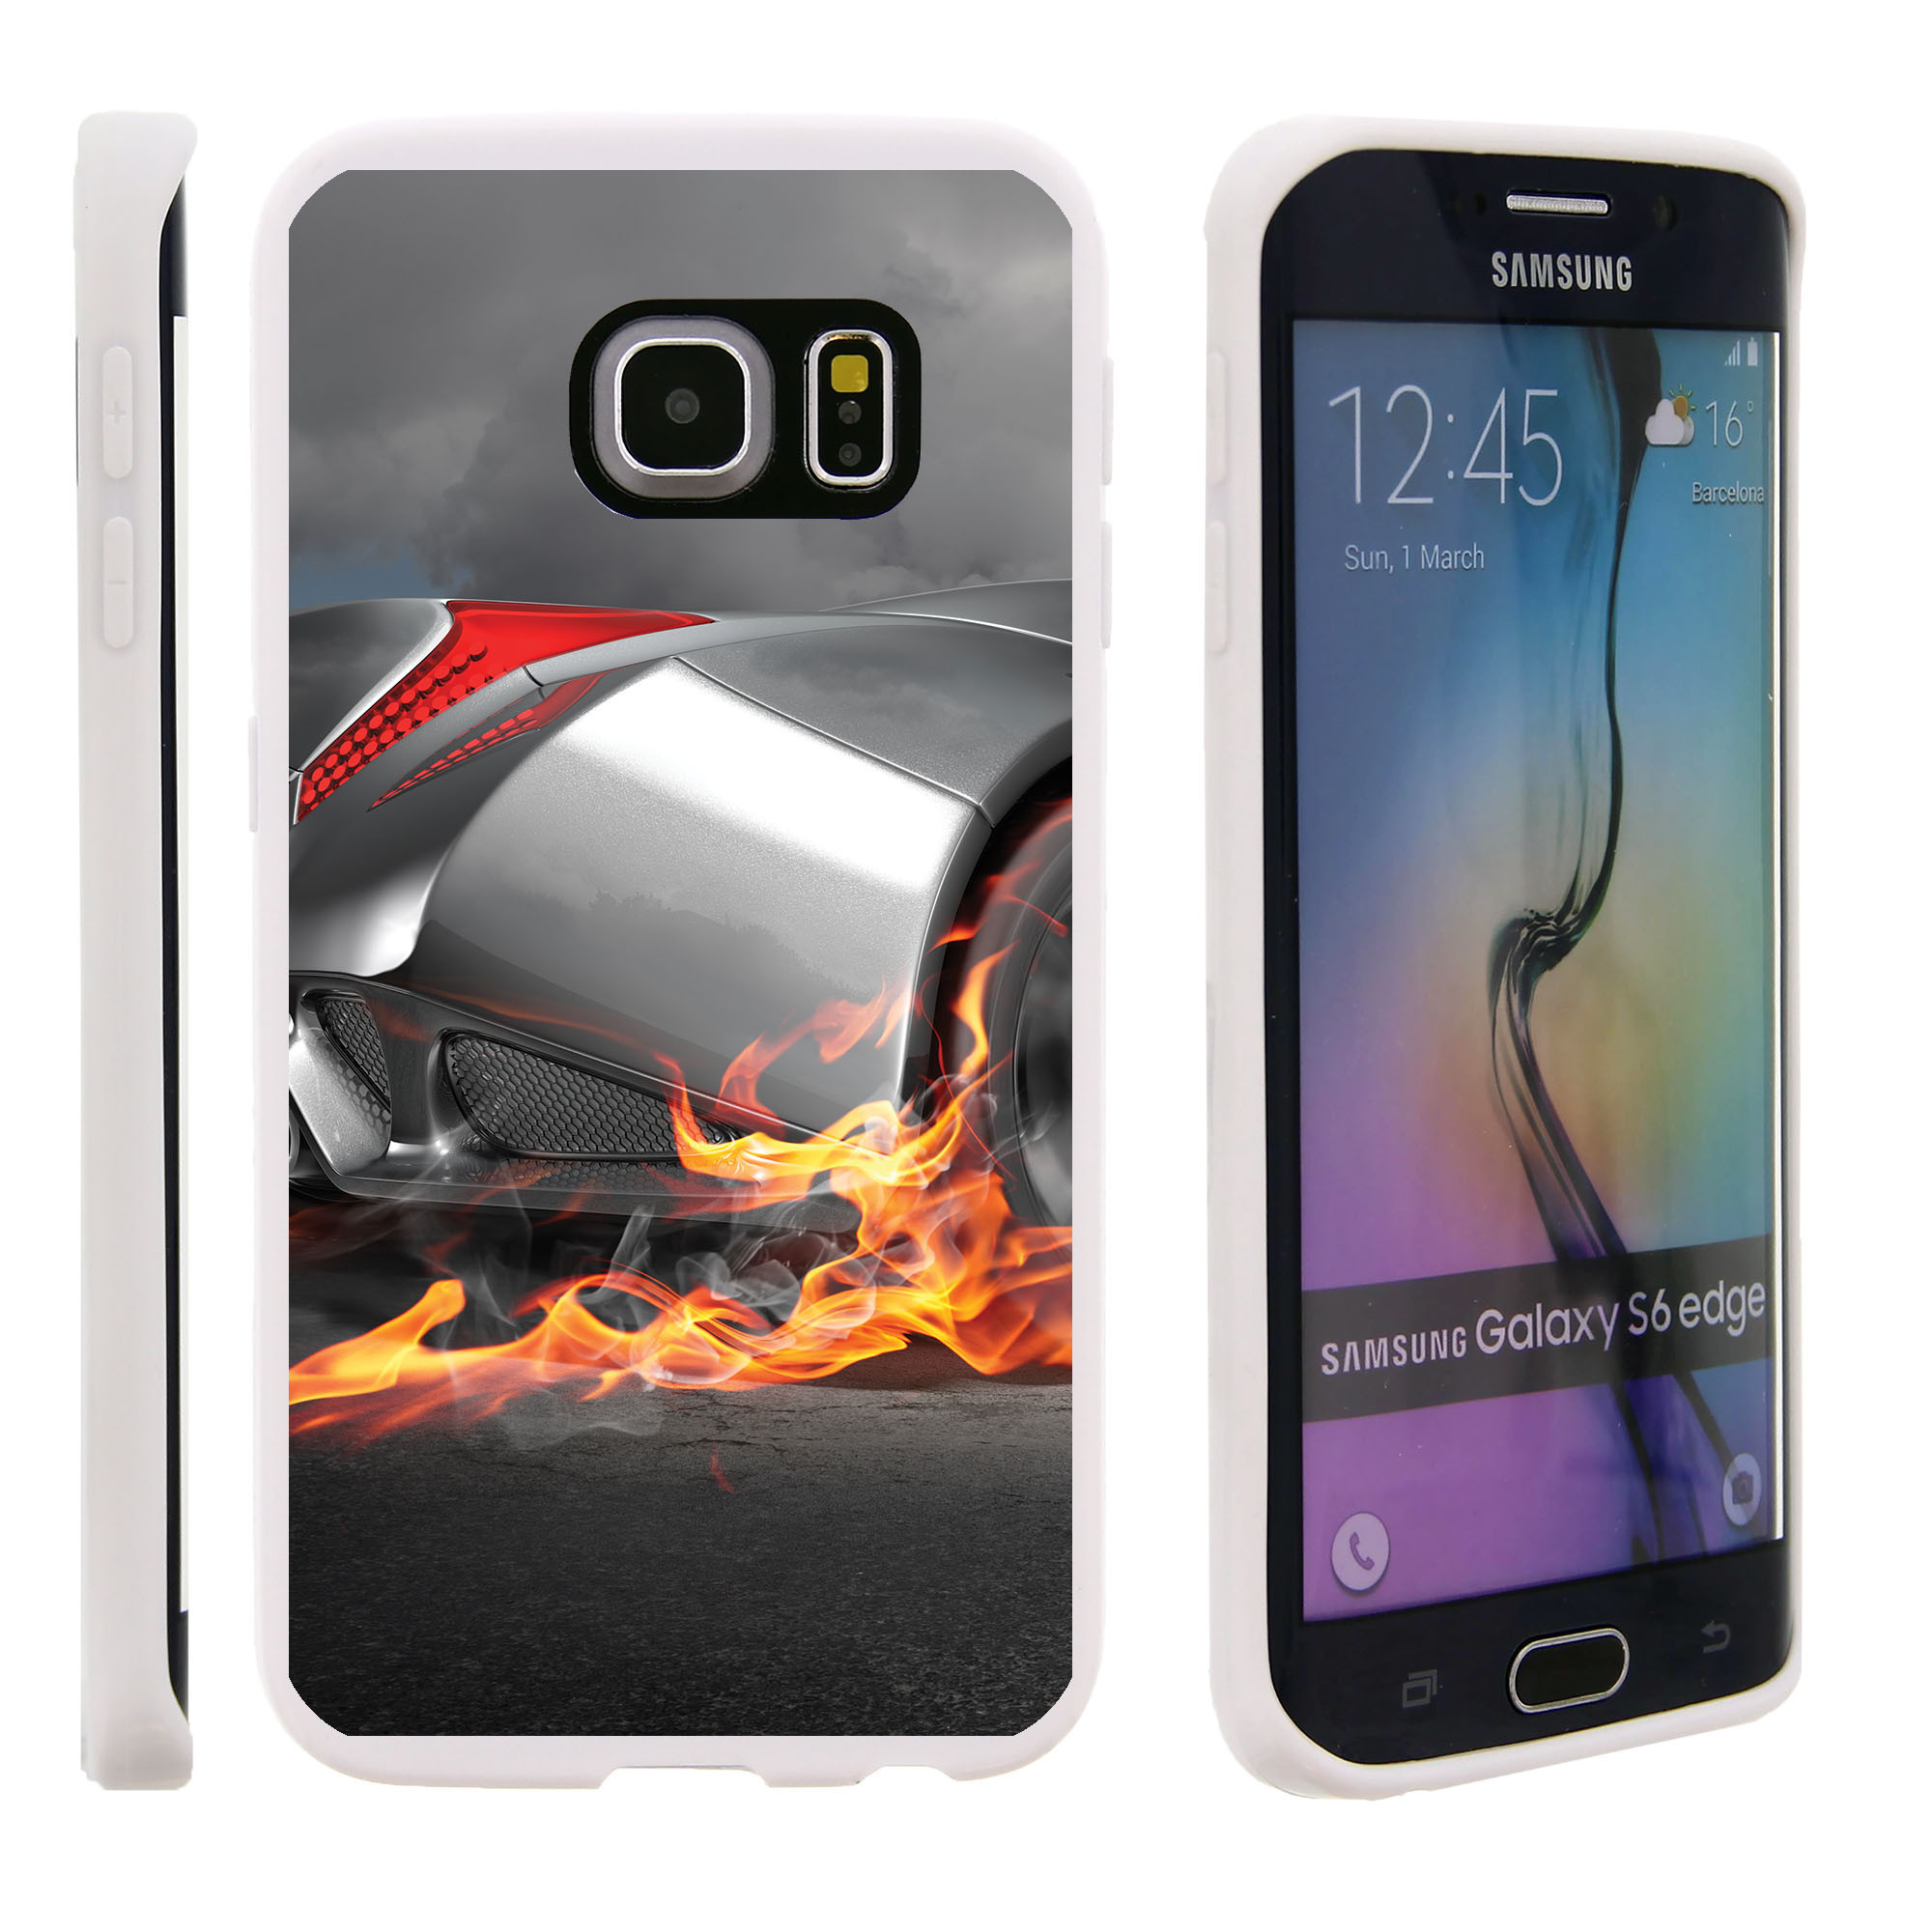 Samsung Galaxy S6 Edge G925, Flexible Case [FLEX FORCE] Slim Durable TPU Sleek Bumper with Unique Designs - Car with Flames